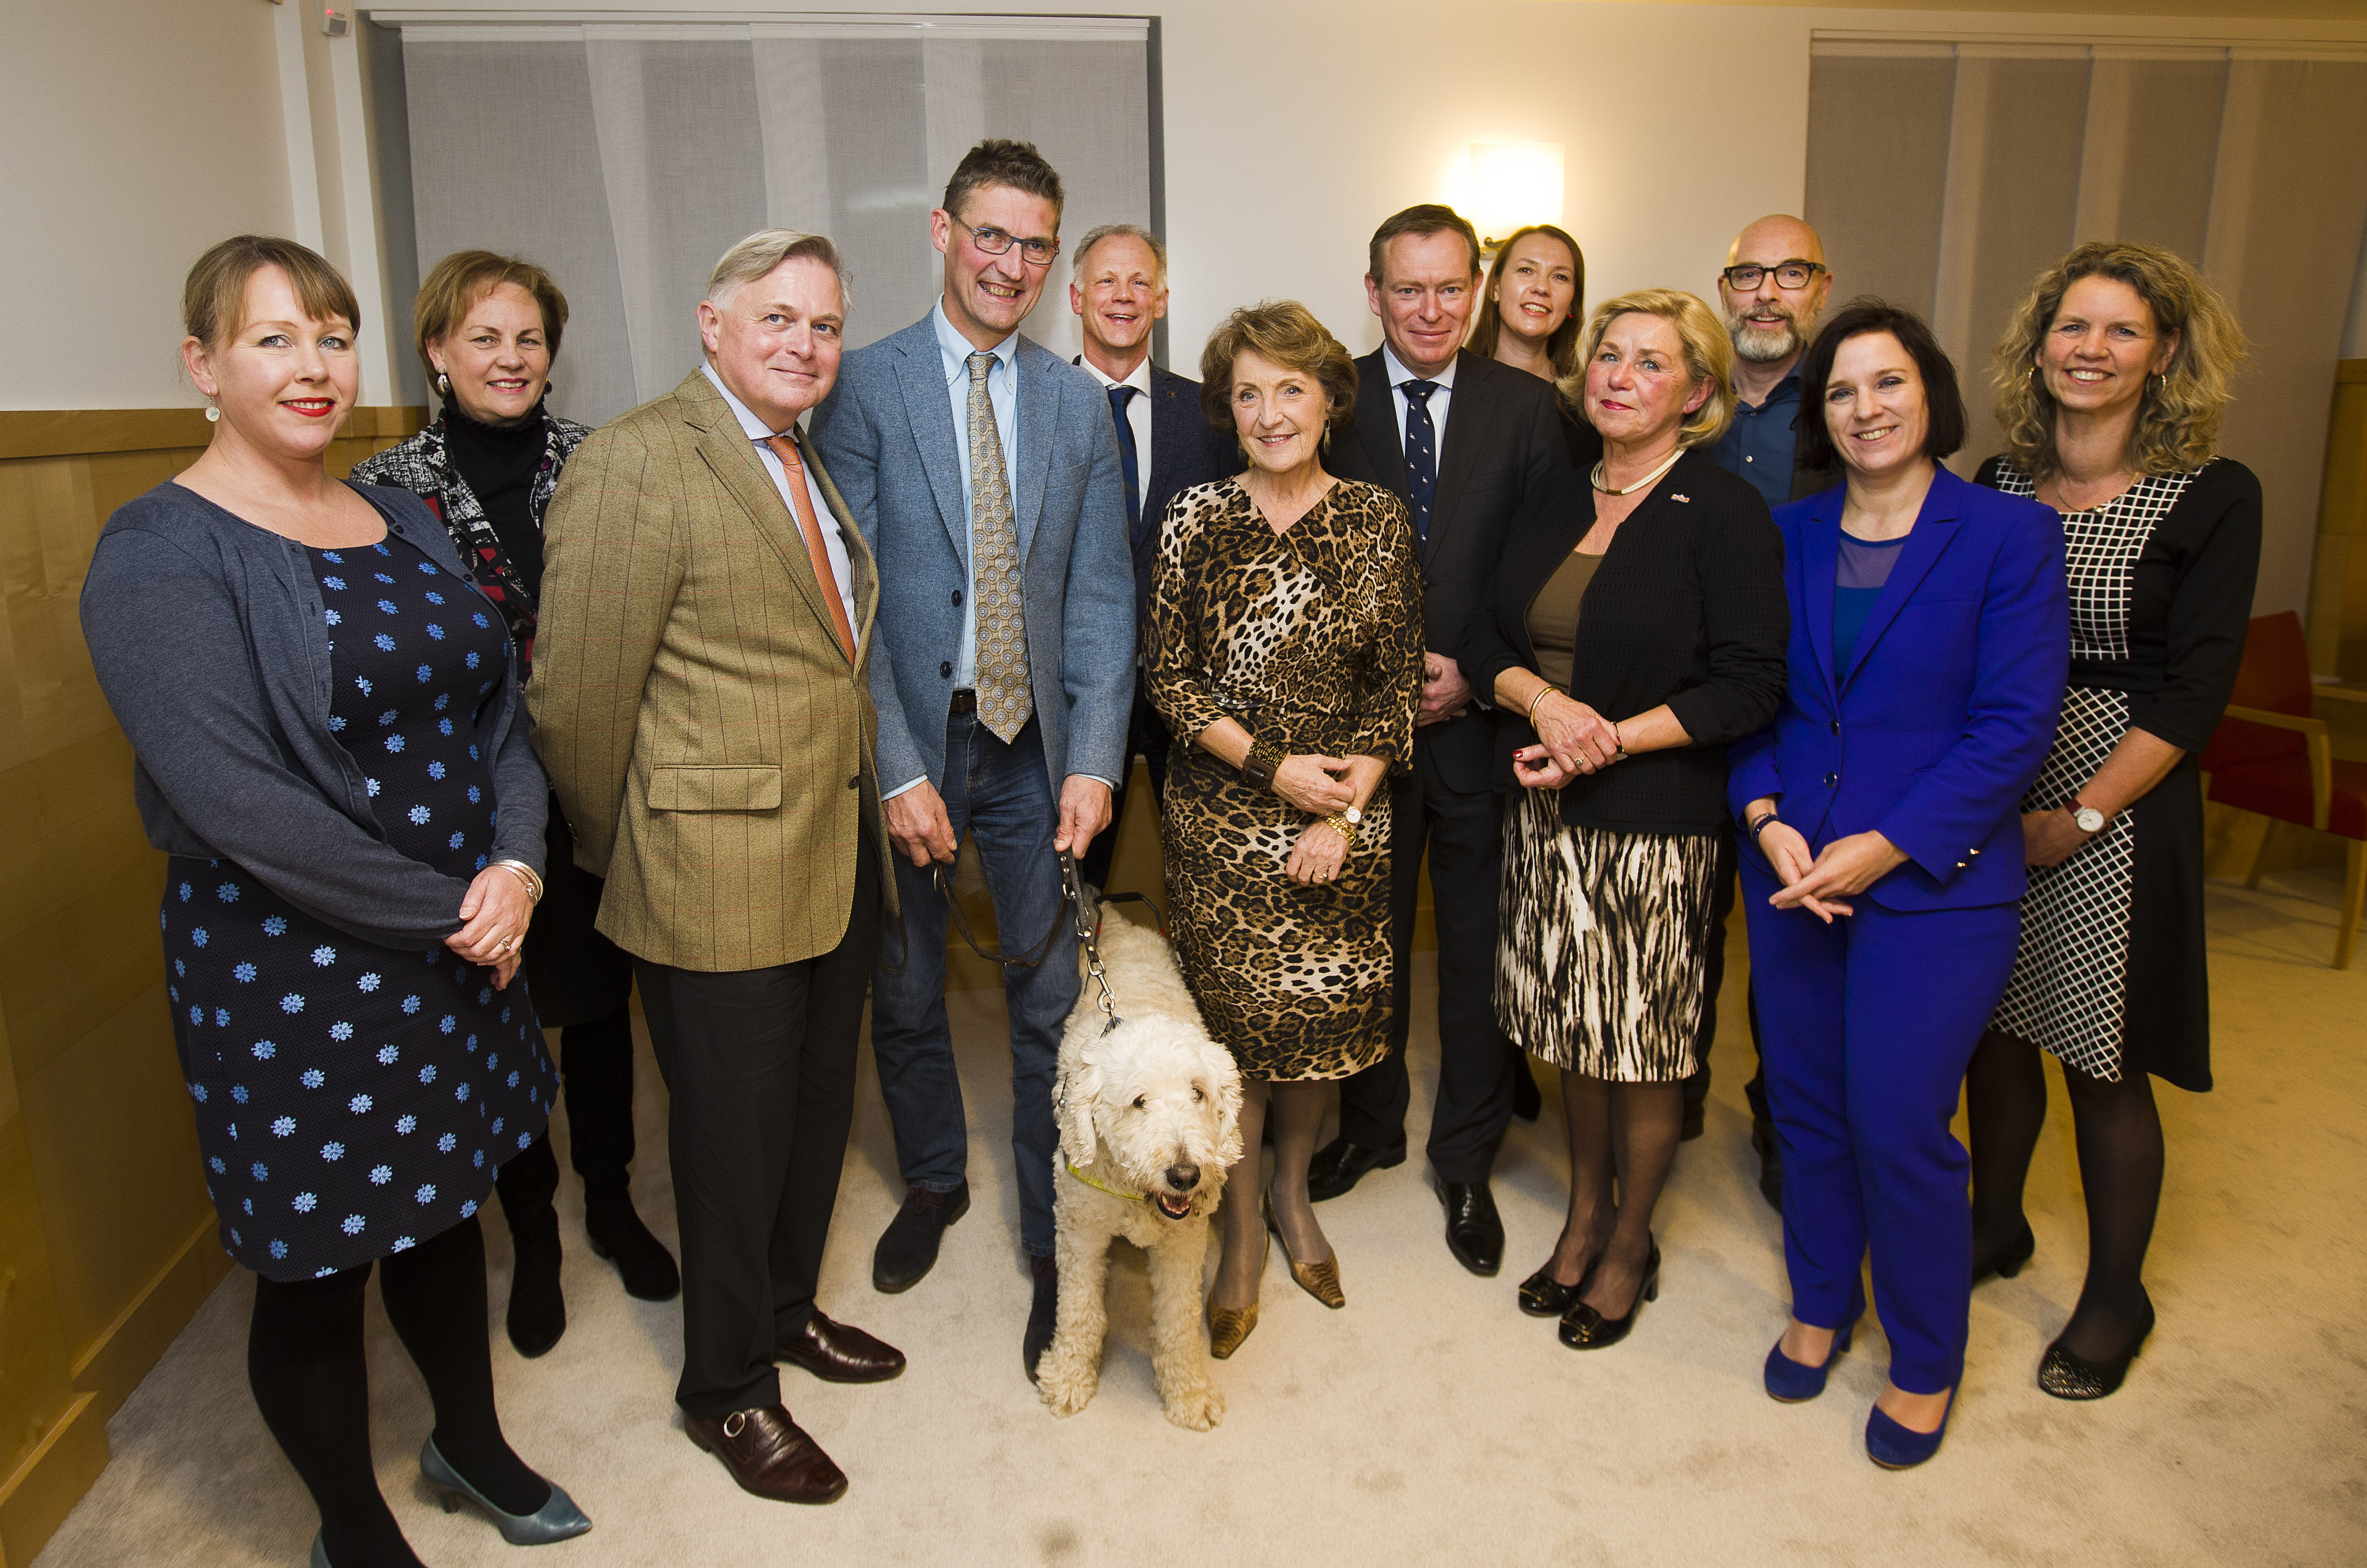 Gezelschap met minister Bruins en prinses Margriet.